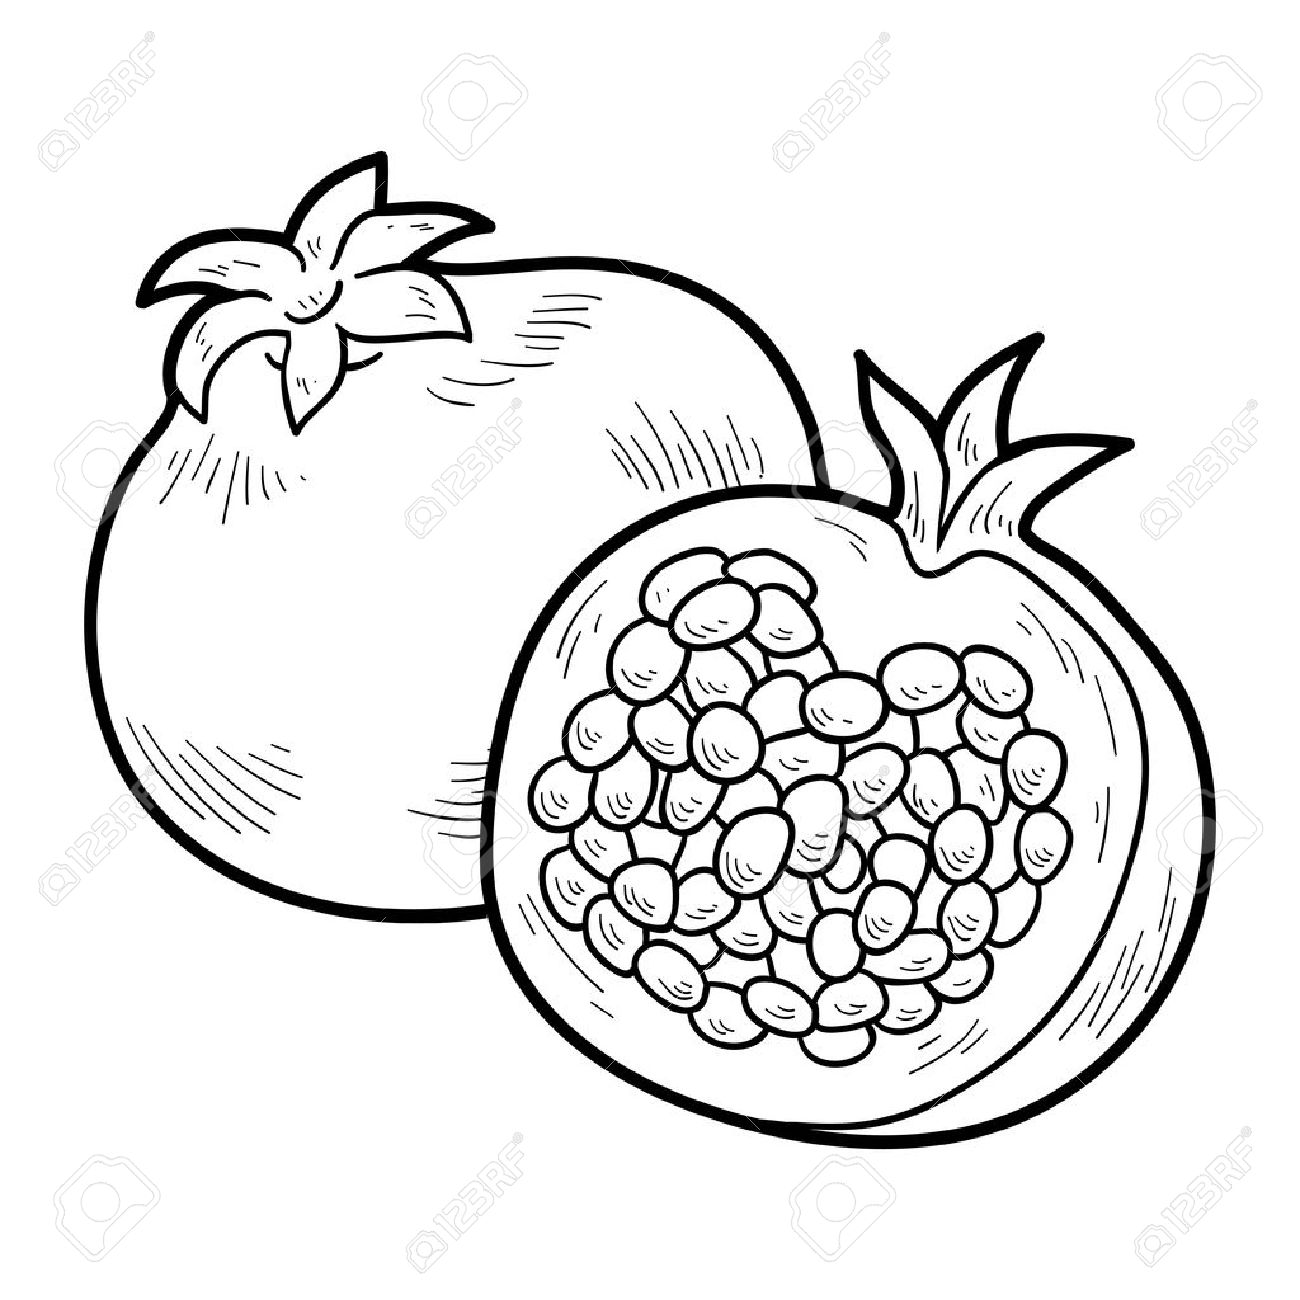 Pomegranate clipart black and white 10 » Clipart Station.